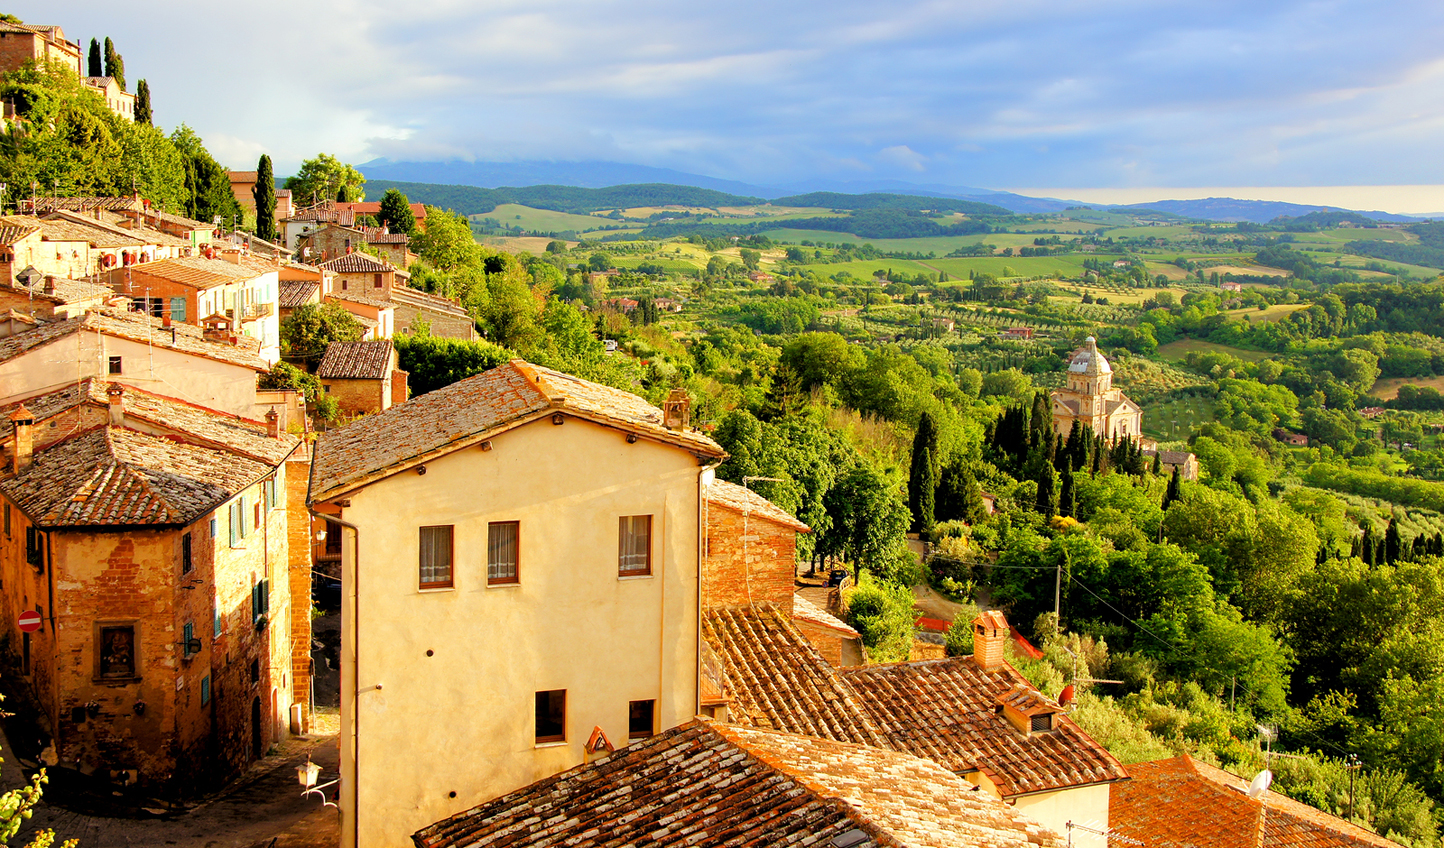 Explore quaint Tuscan towns